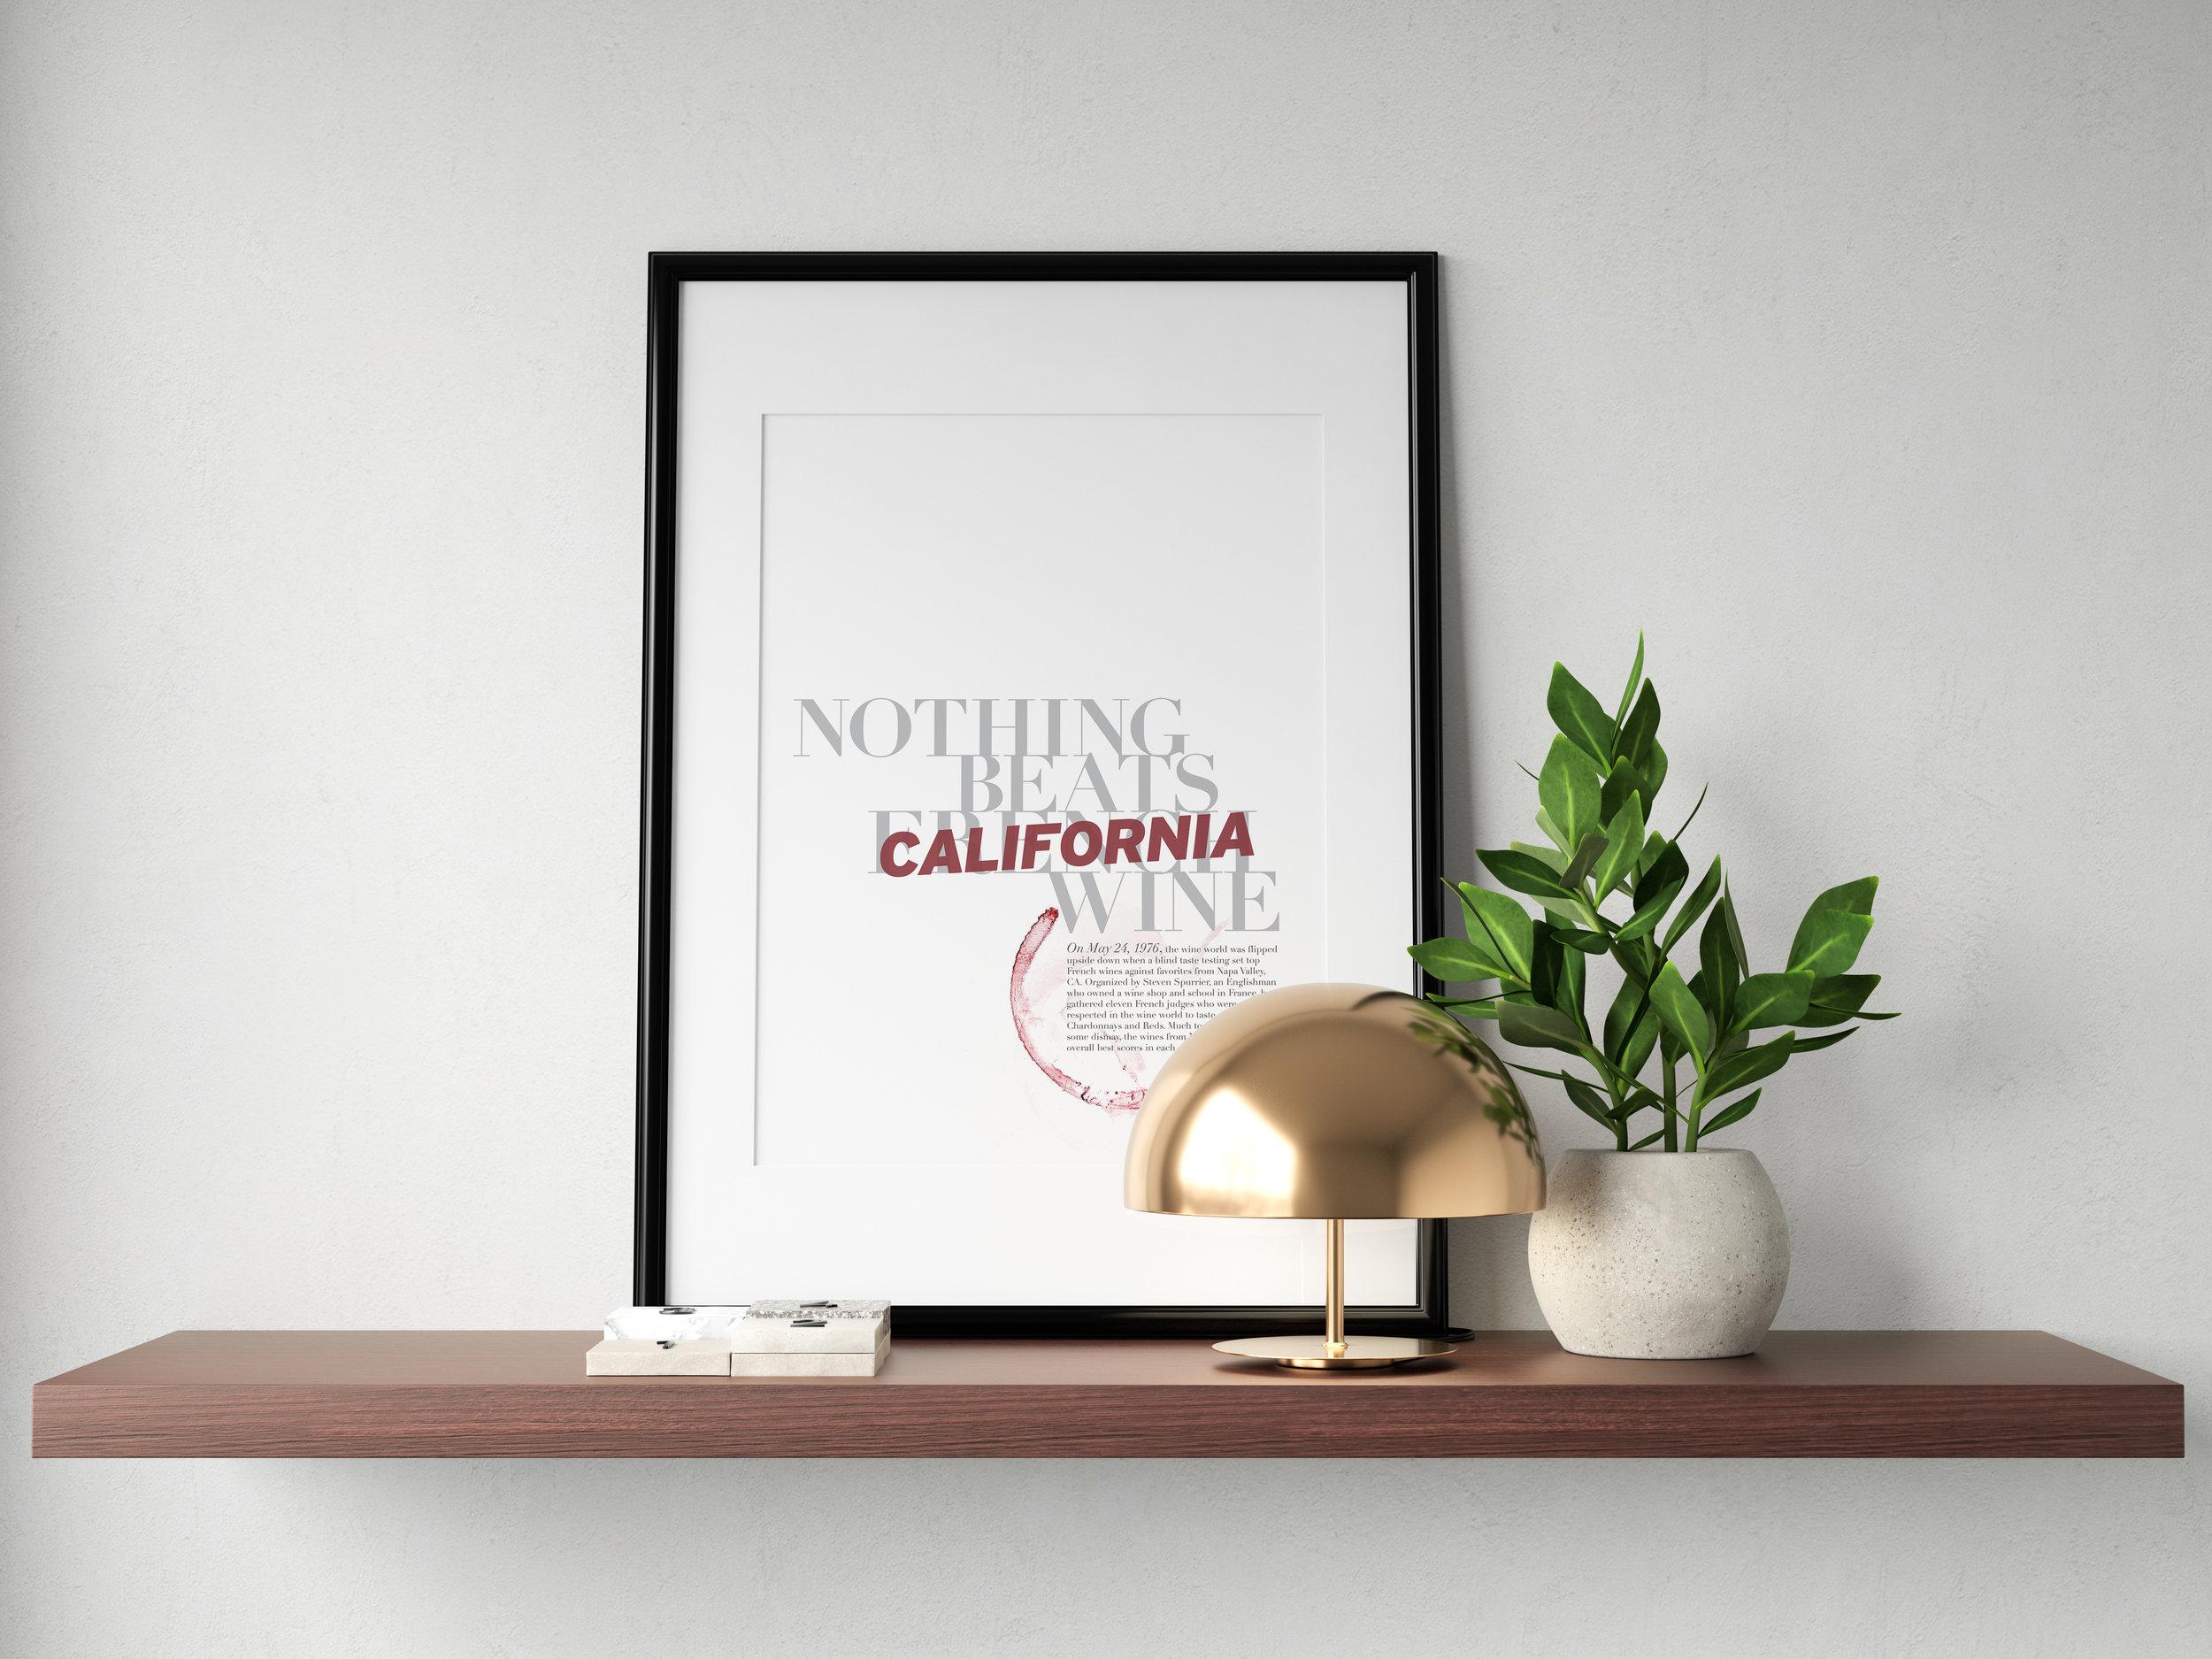 CaliforniaWine_mockup_3.jpg